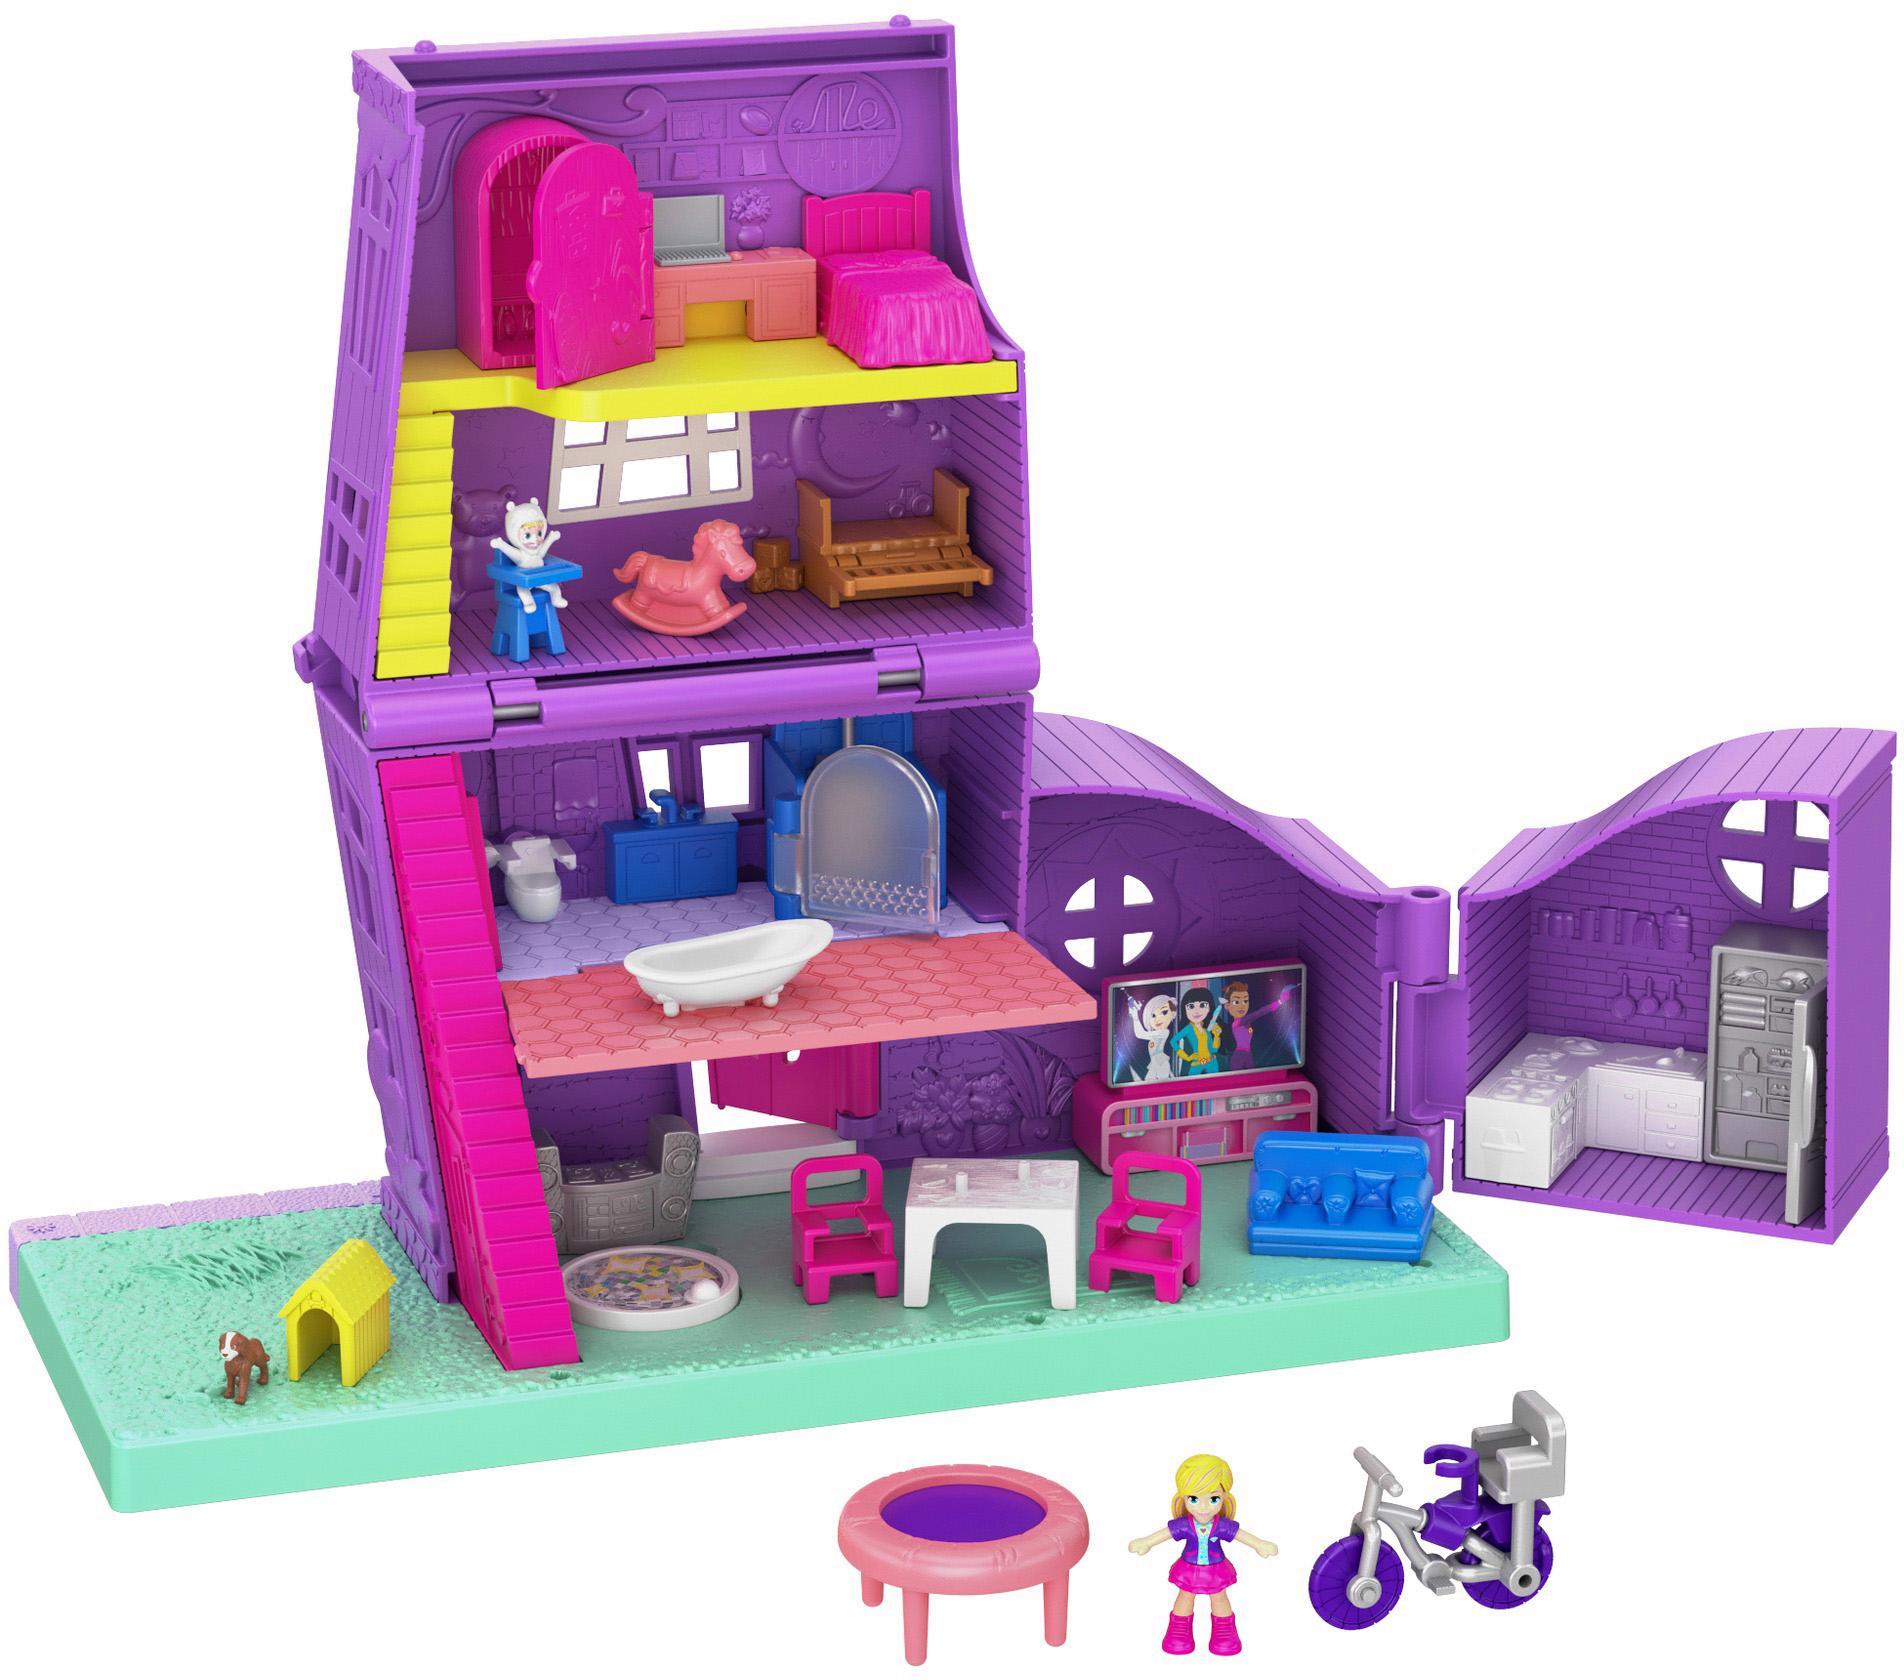 "Mattel Puppenhaus ""Polly Pocket Pollys Haus"" Kindermode/Spielzeug/Puppen/Puppenhaus"